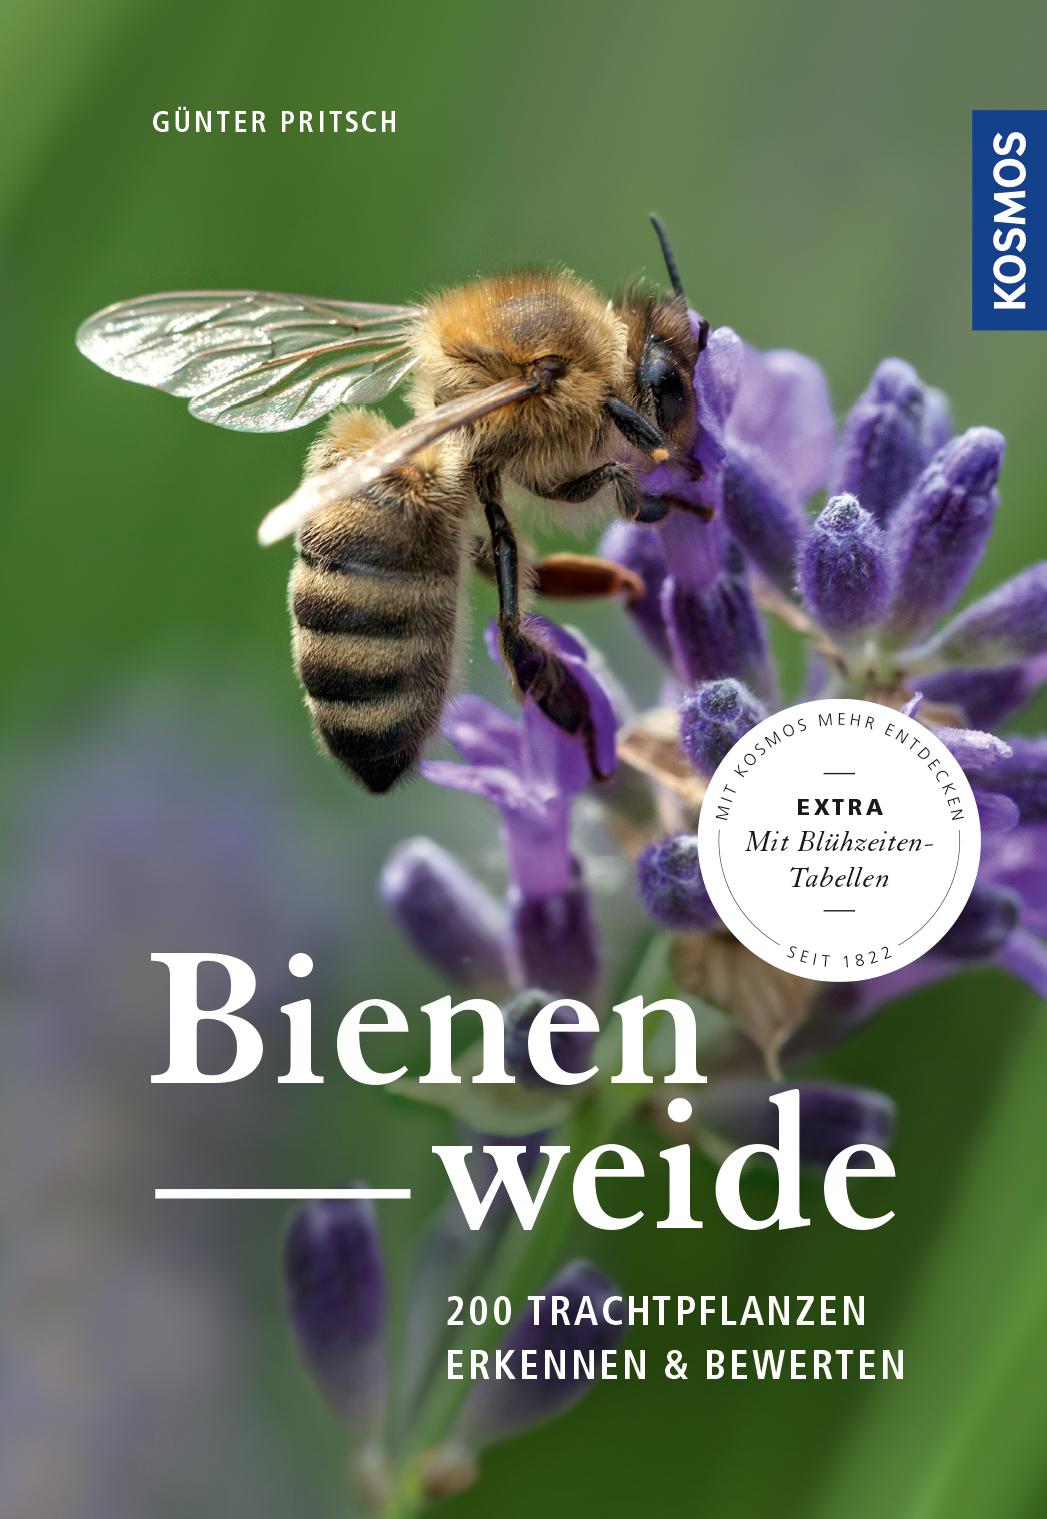 Pritsch_Bienenweide_tif_web-jpg.indd